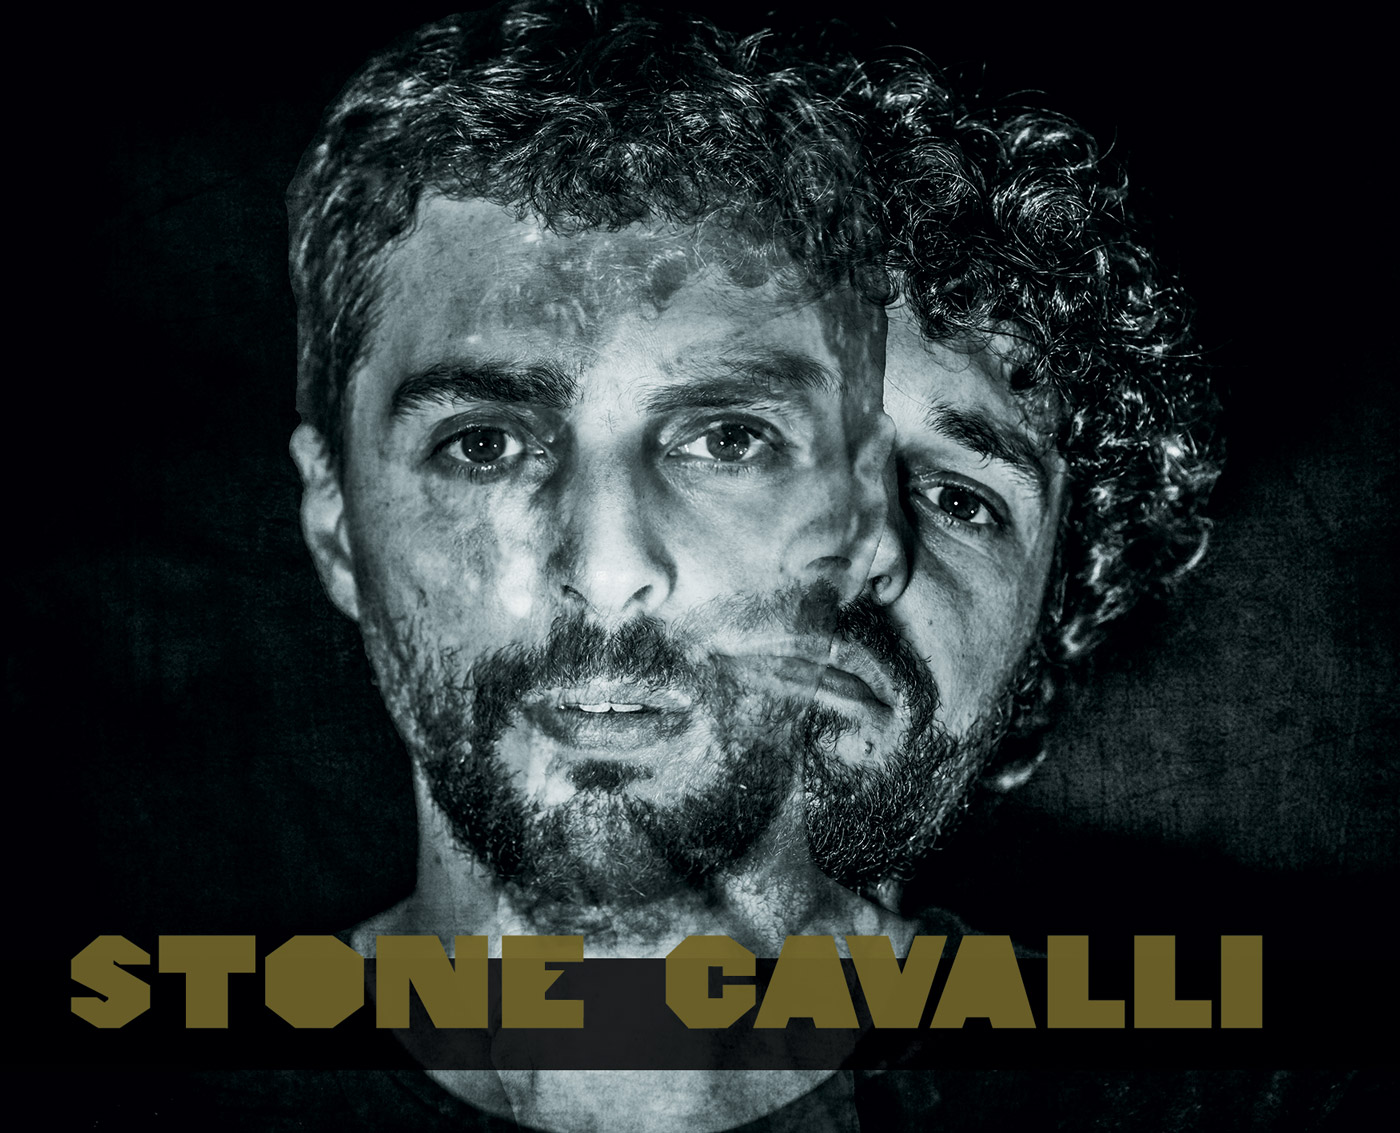 Stone Cavalli - Bandini EP